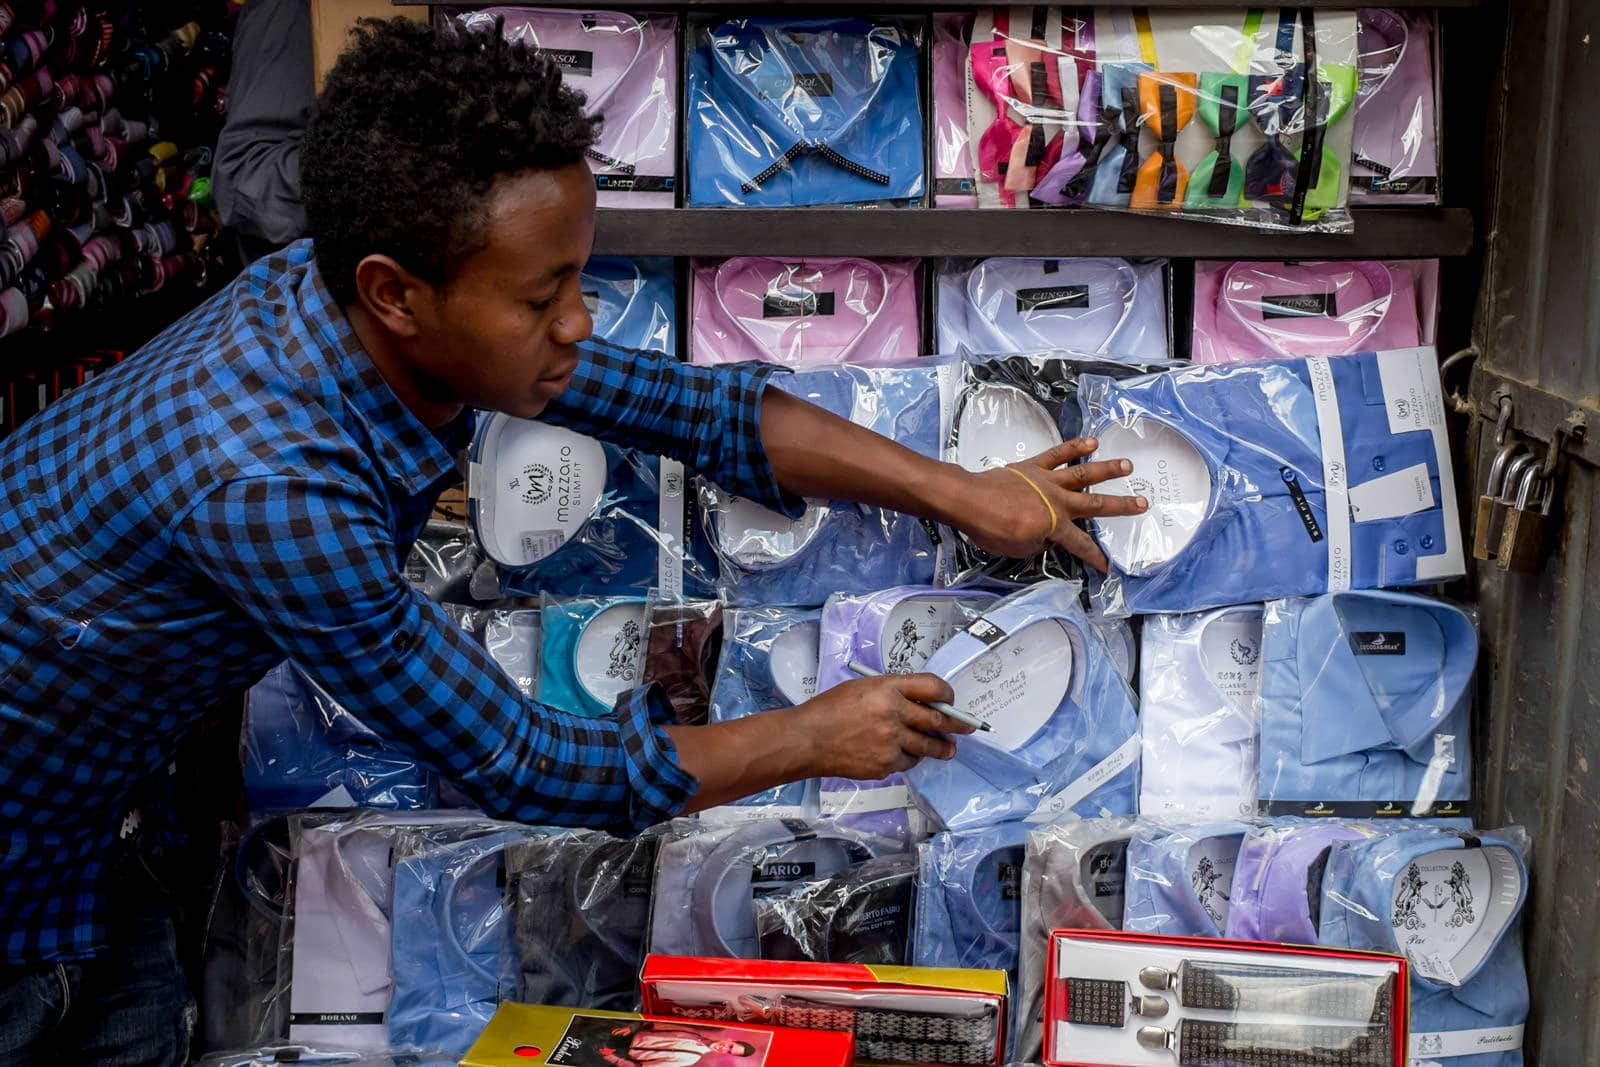 man selling shirts in Addis Merkato market in Ethiopia